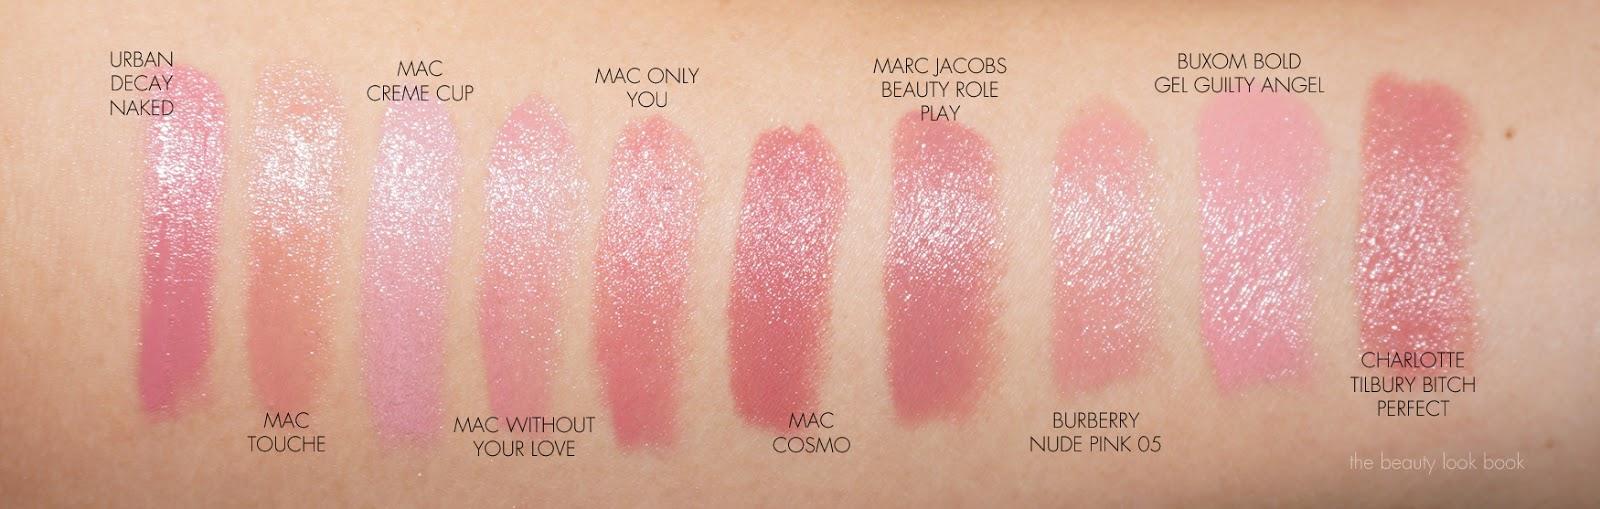 Mineralize Rich Lipstick by MAC #10